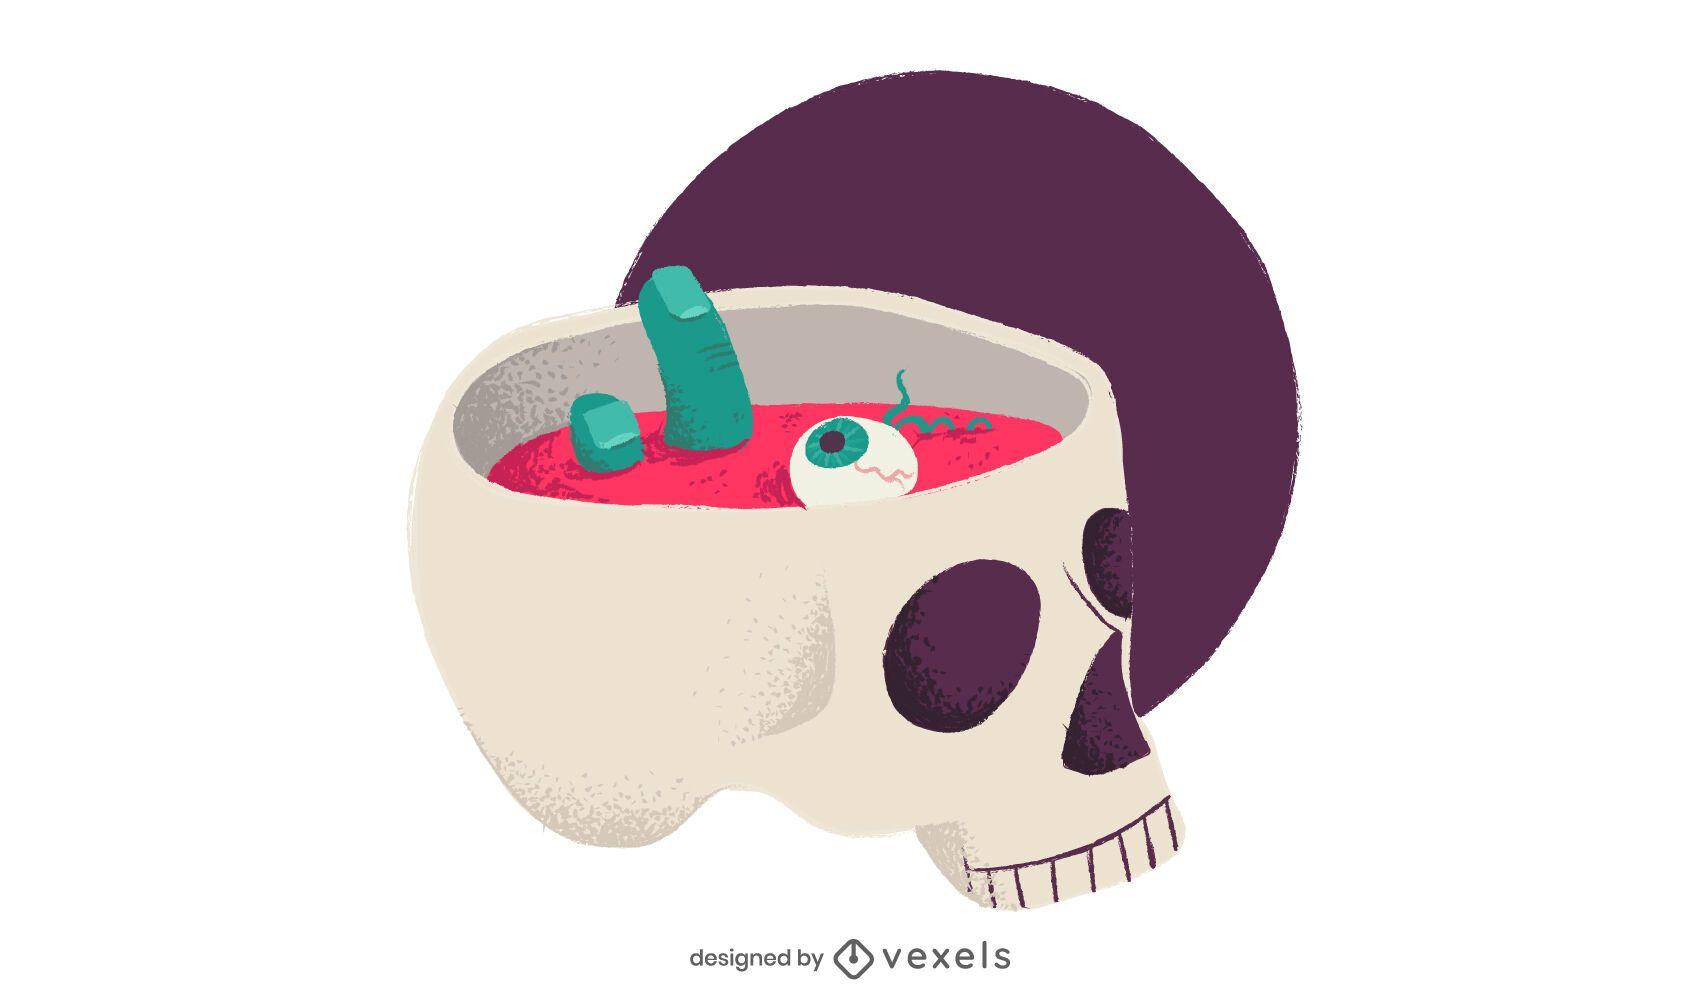 Skull bowl illustration design